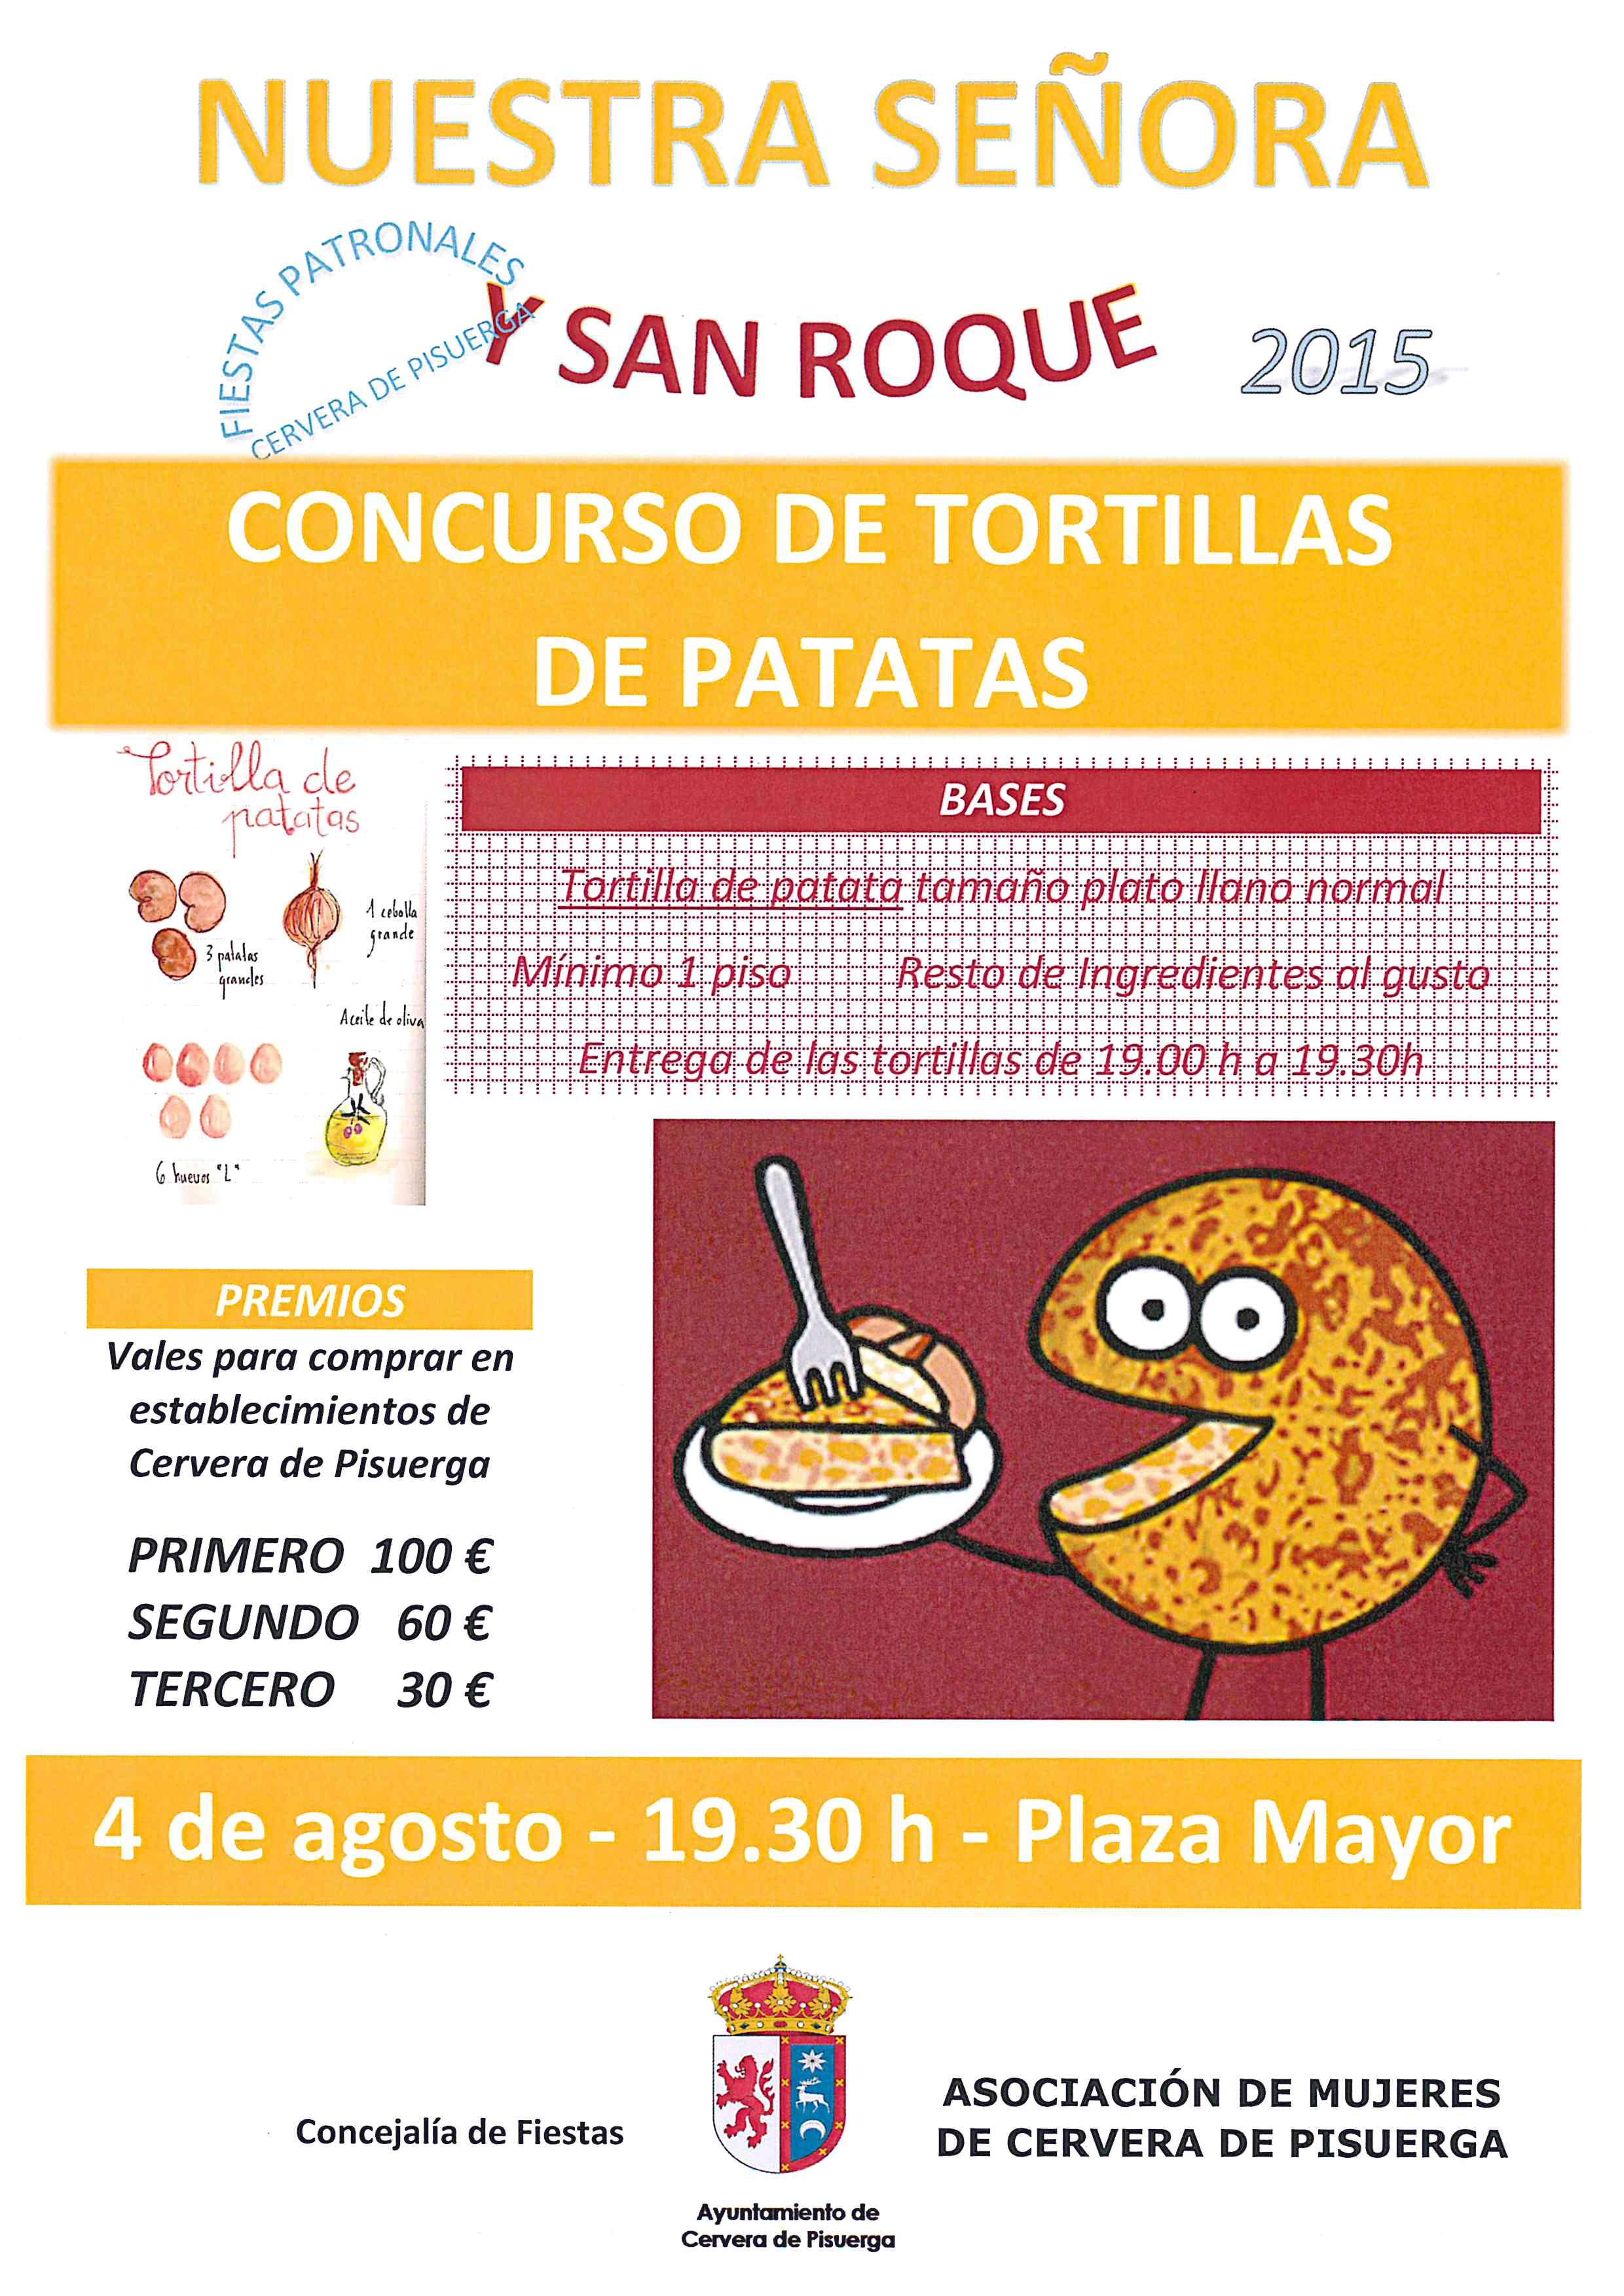 Concurso de Tortillas de Patata